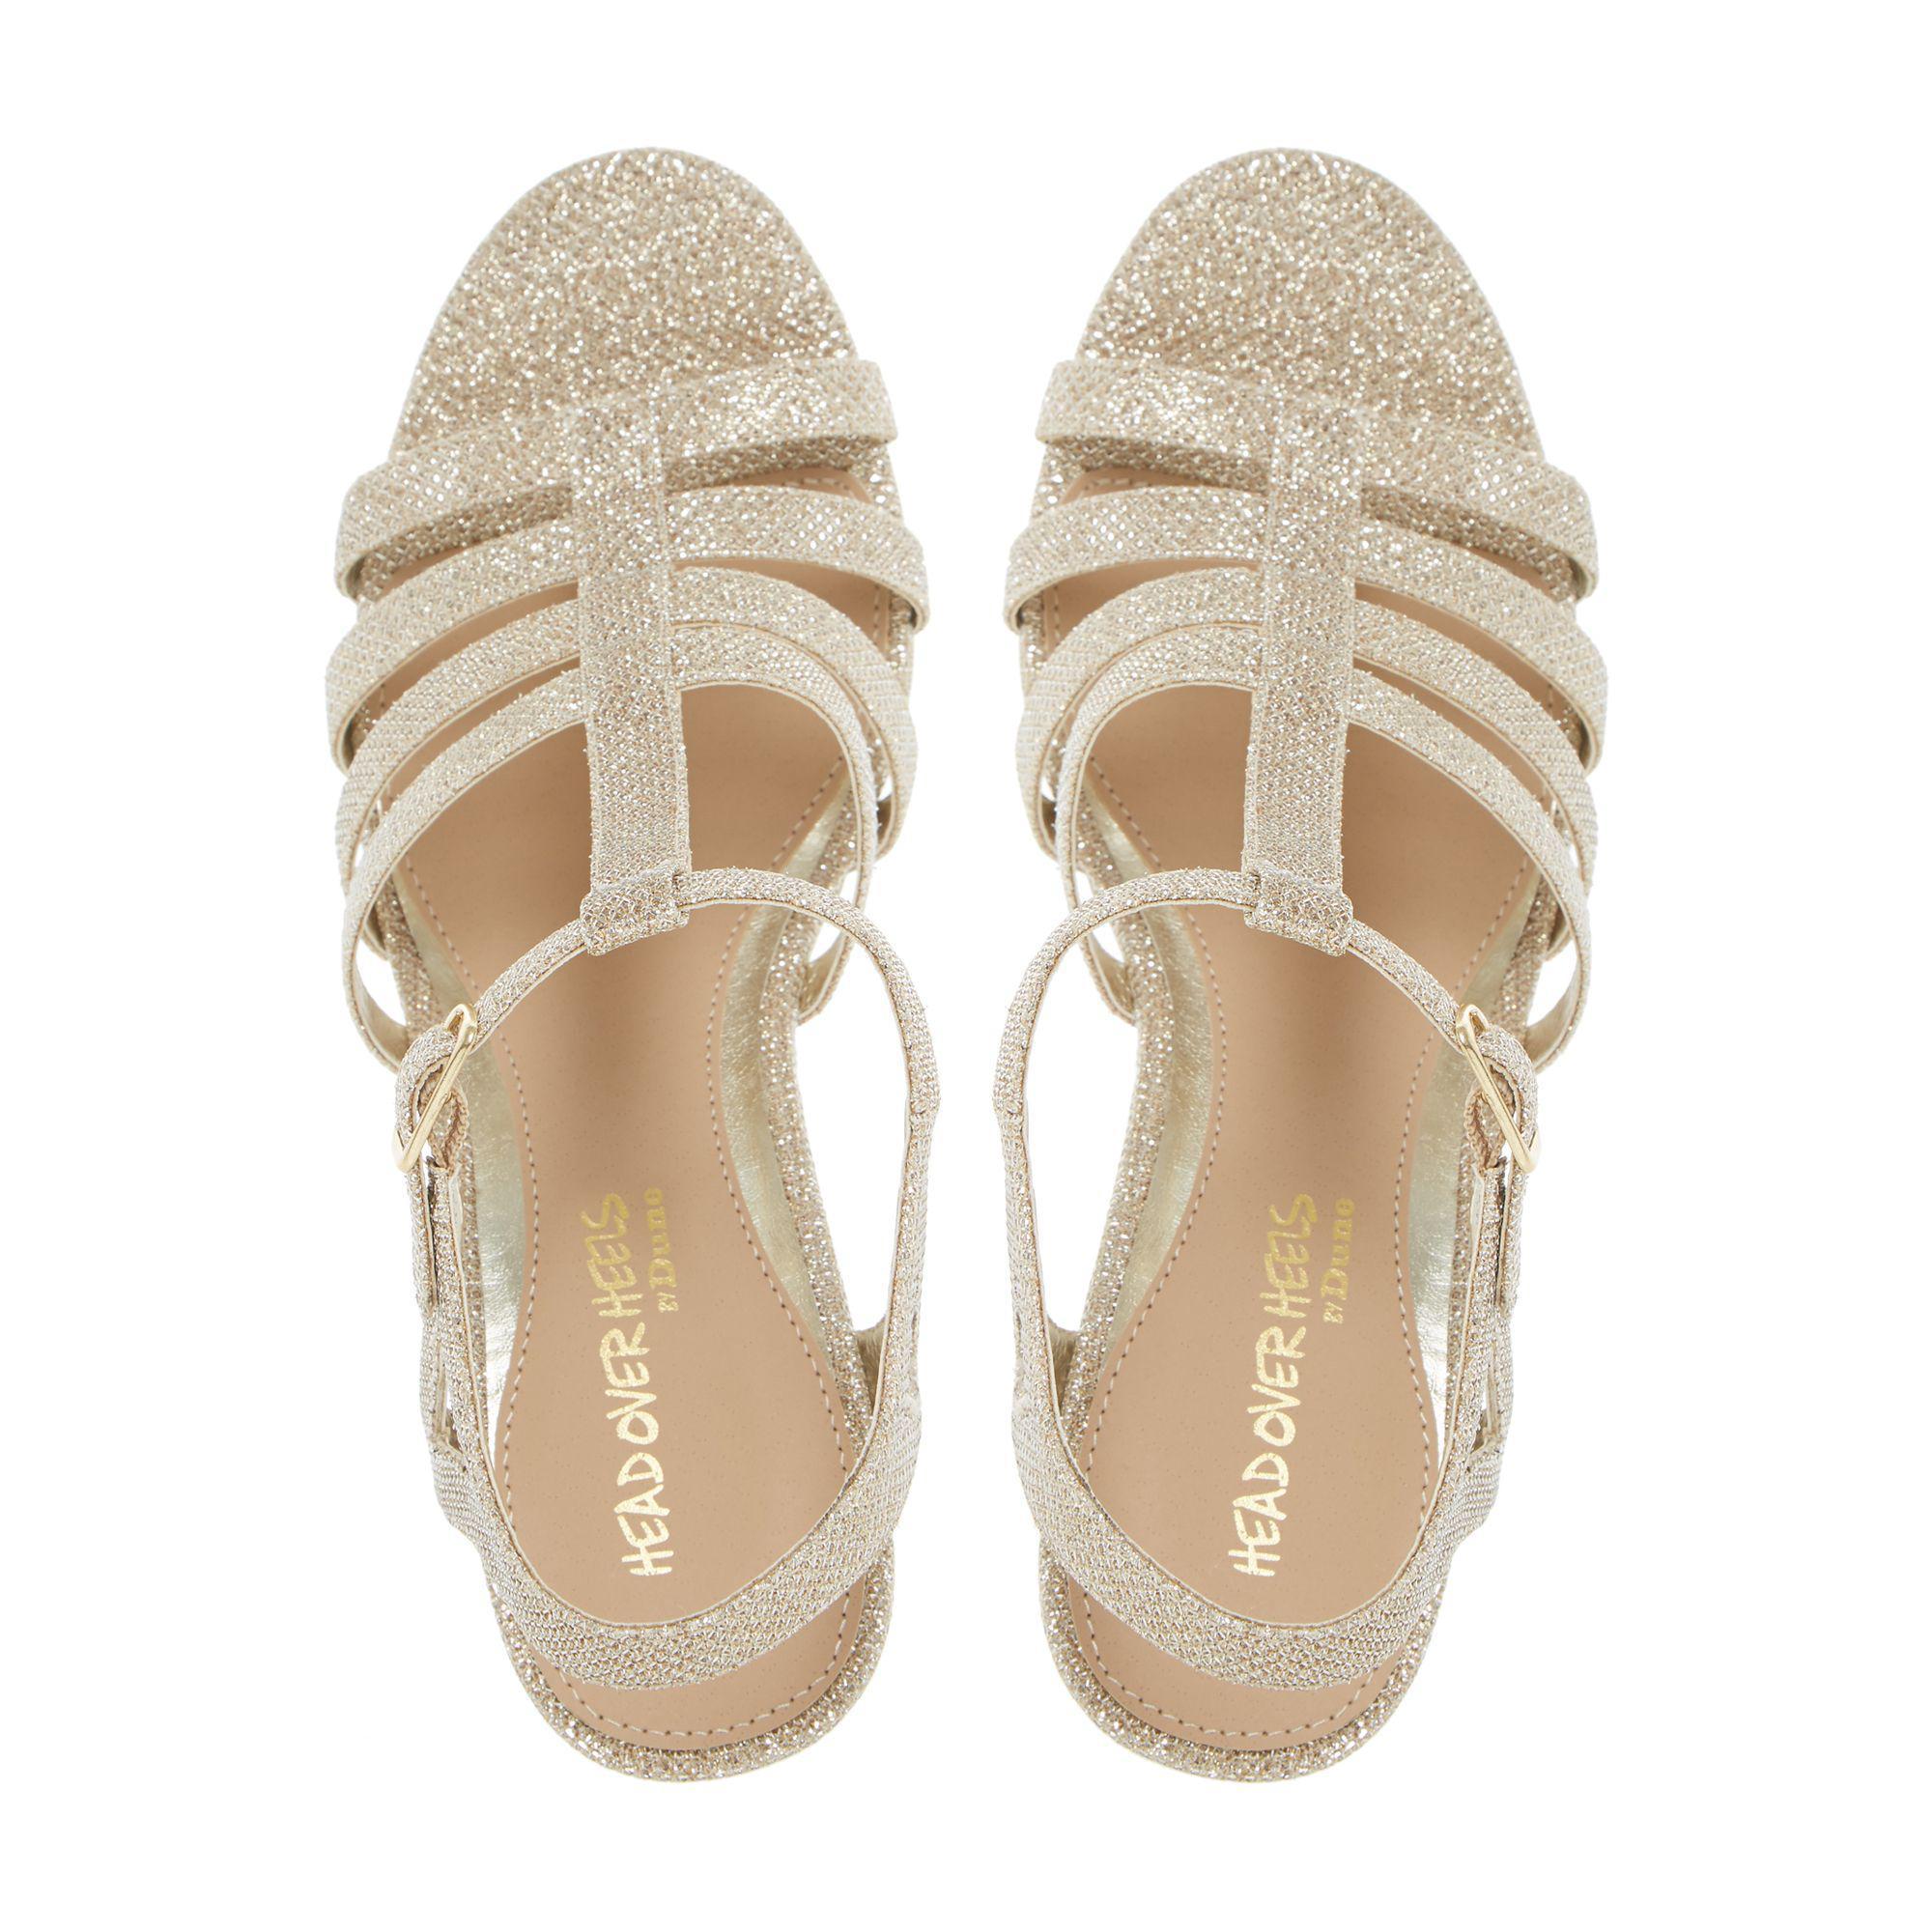 45327eeb271d Dune Gold  keeli  T-bar Cork Wedge Sandals in Metallic - Lyst